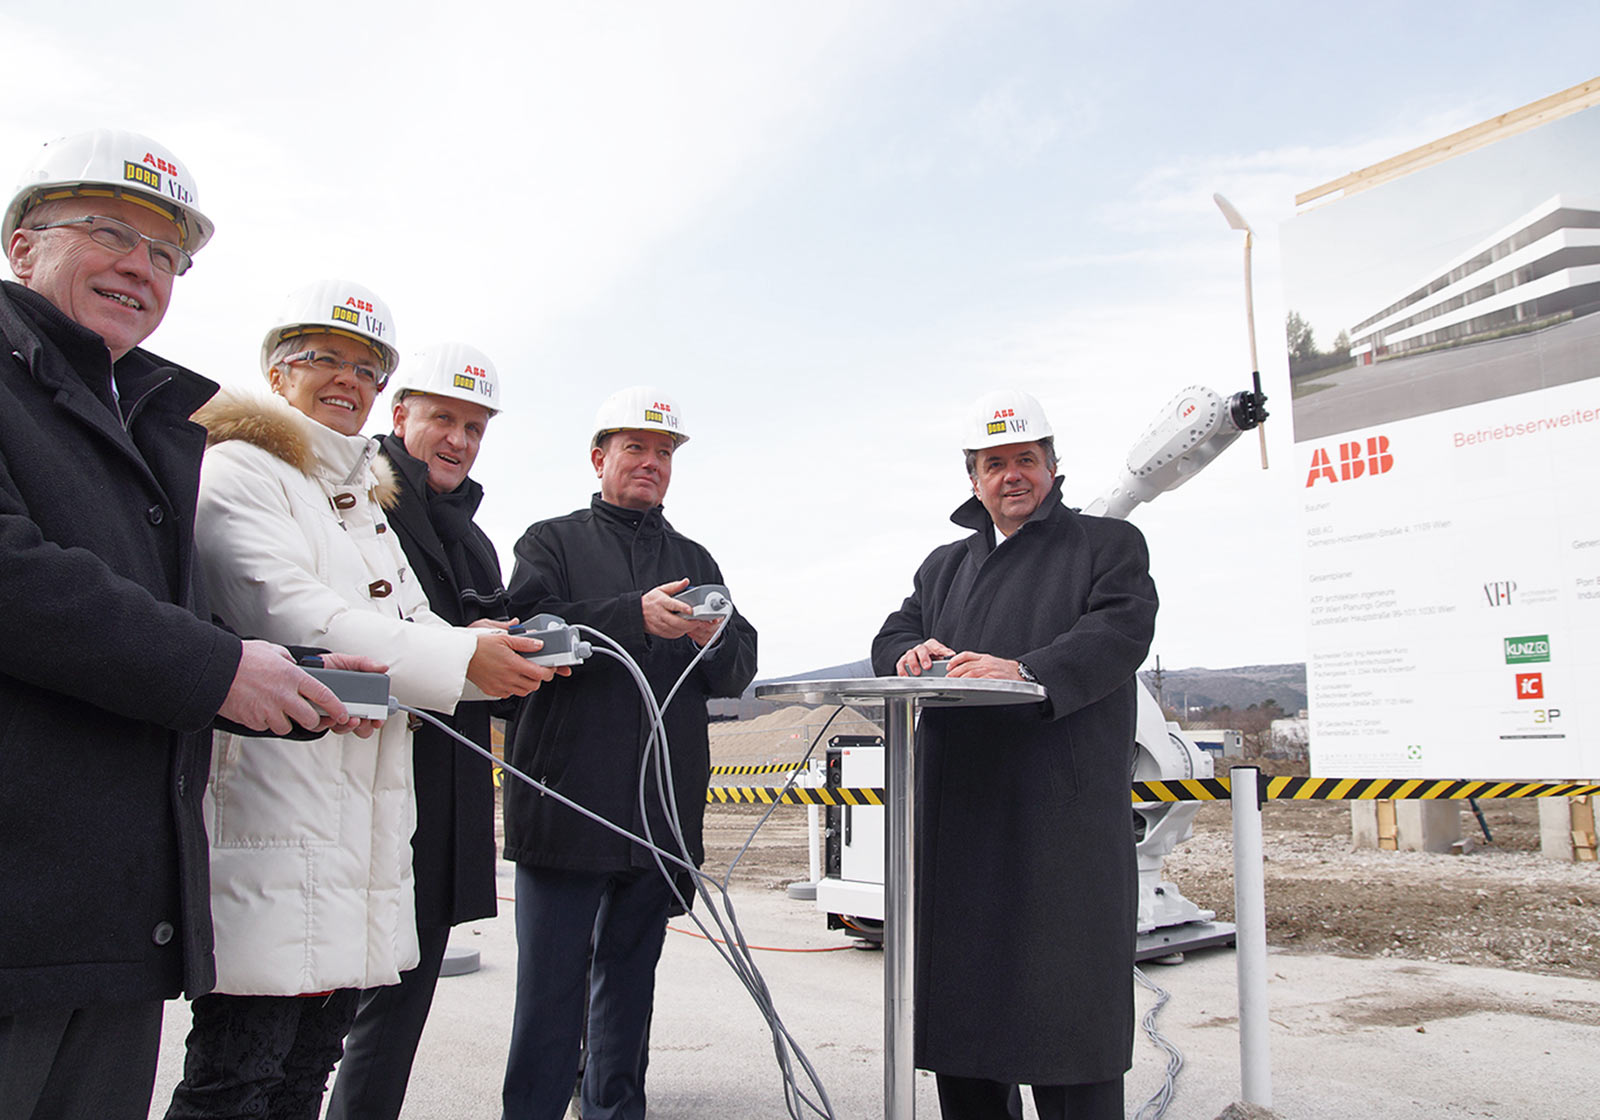 Слева направо: Йоханн Айгнер (PORR), Петра Богуслав, Хорст Райнер (ATP), Герберт Яншка, Франц Шалупеки (ABB). Фото: ABB